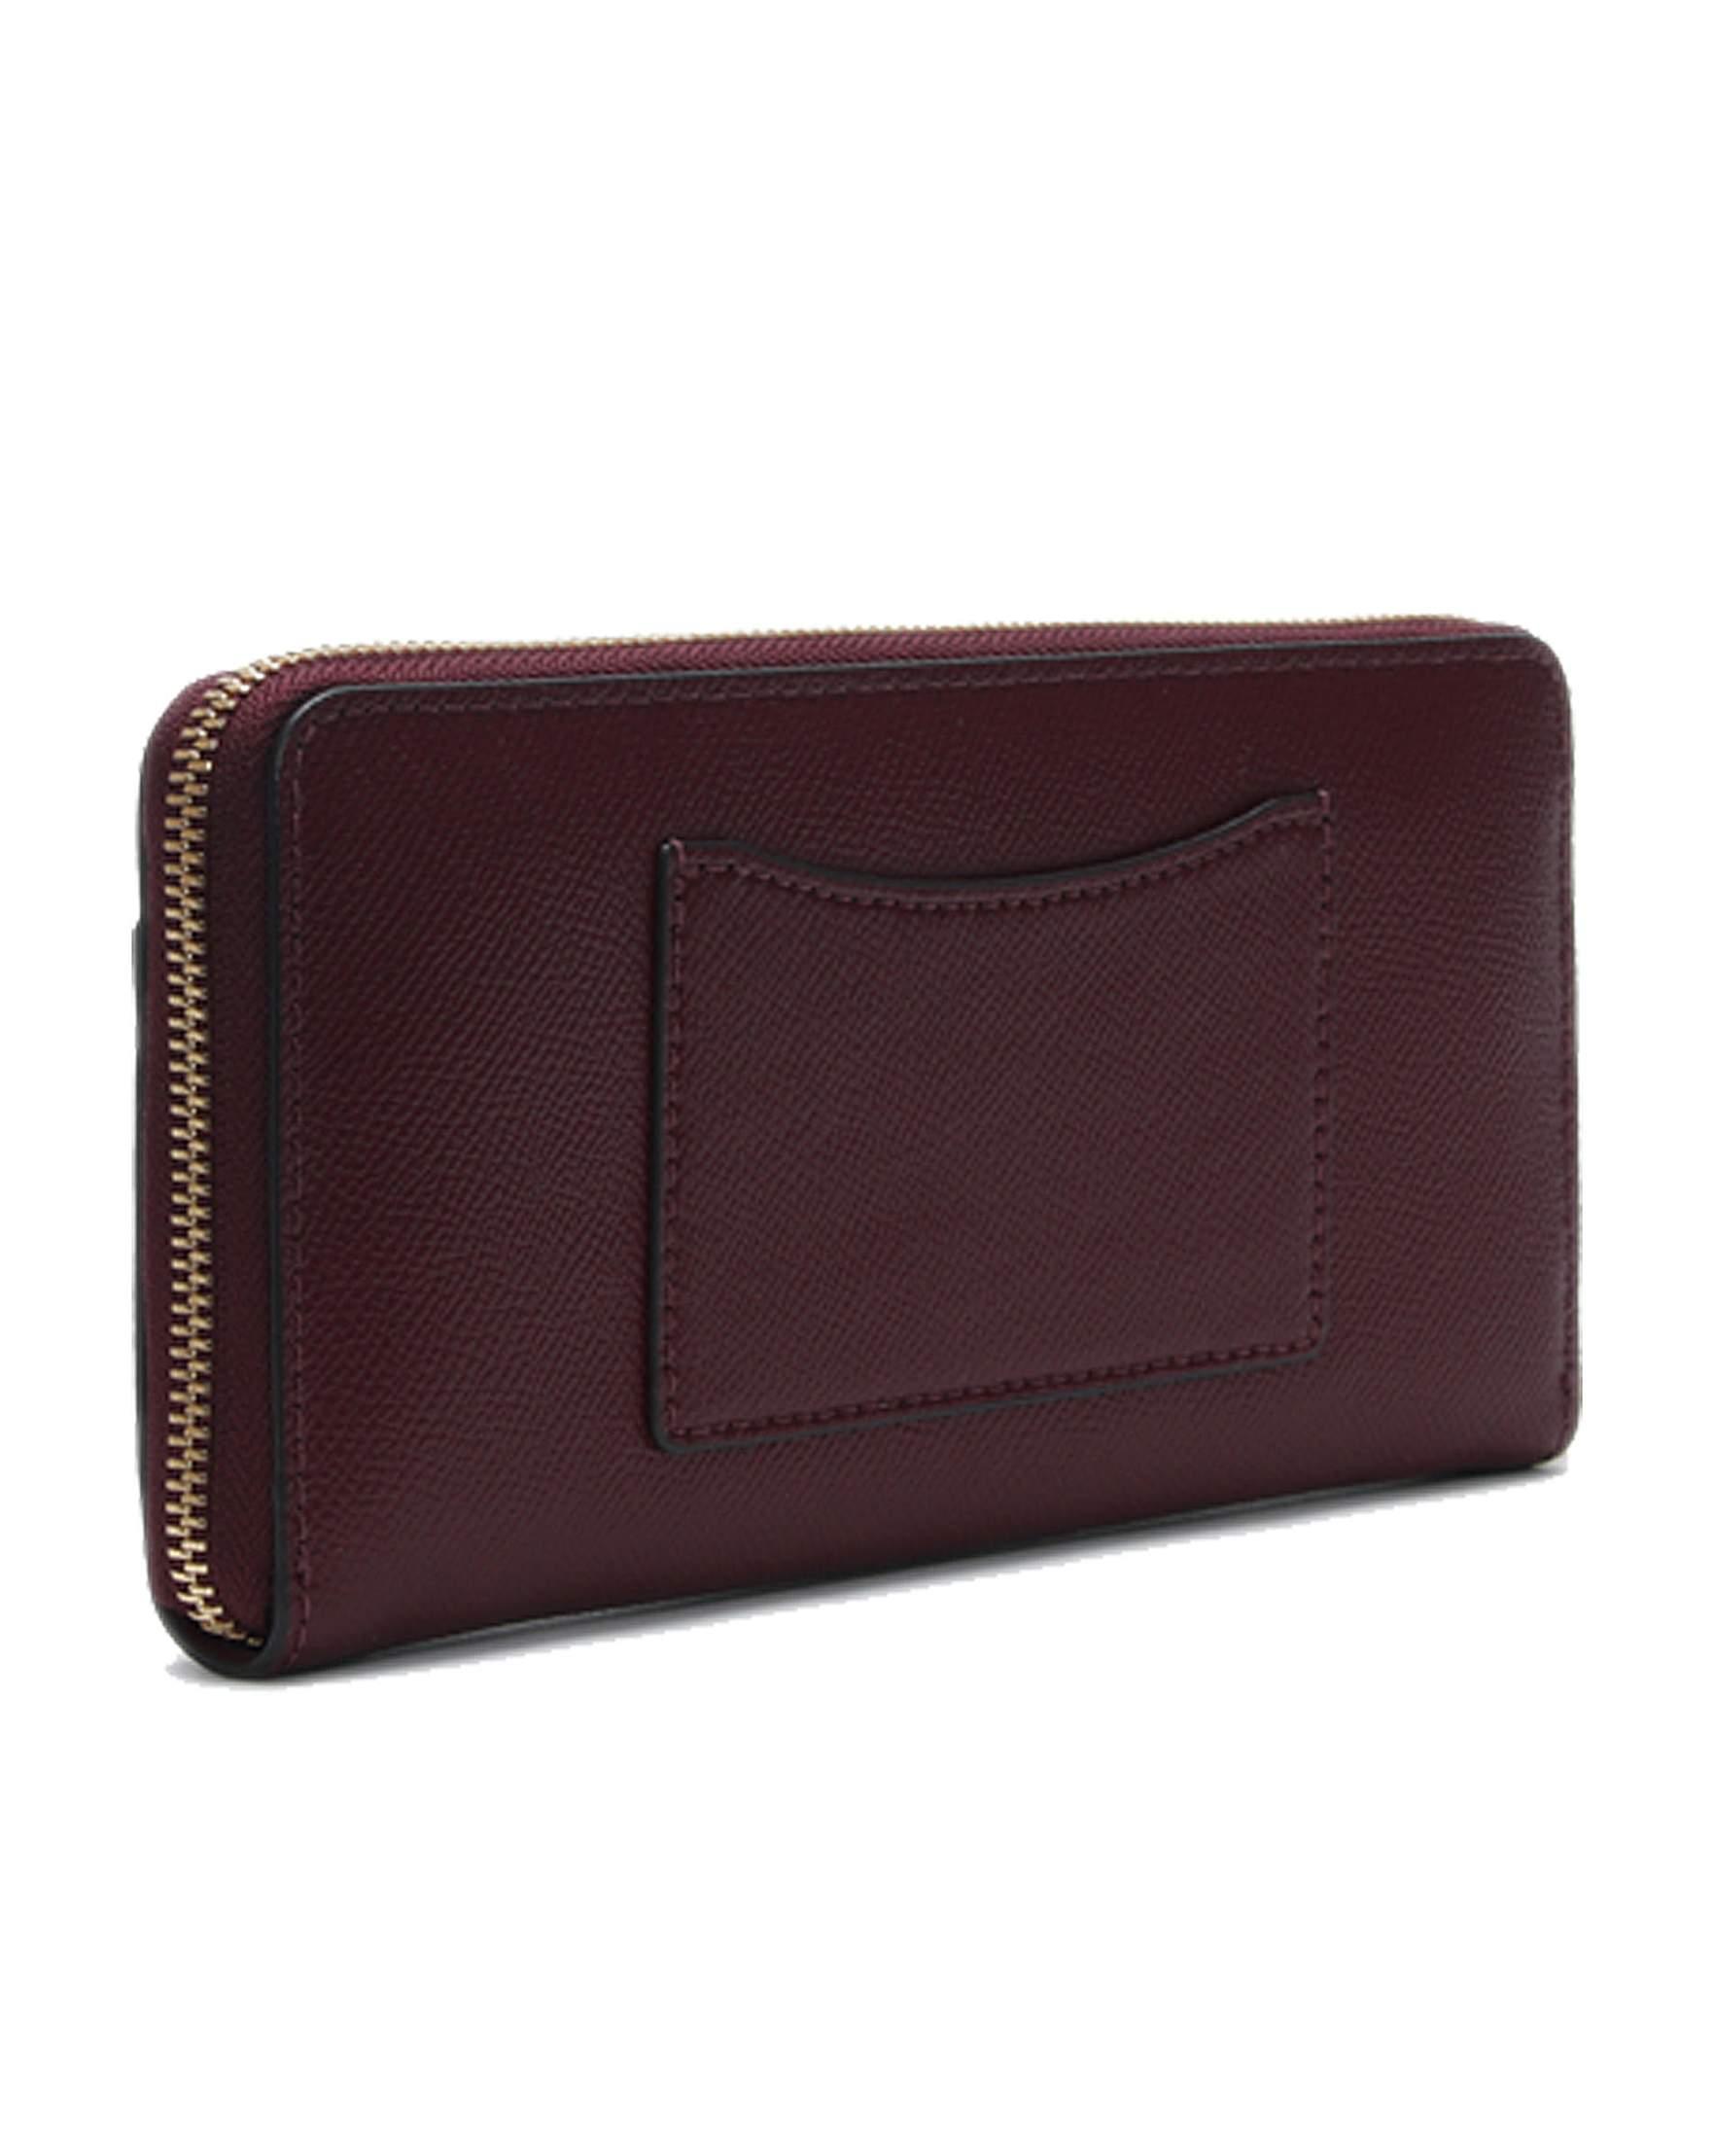 805df84bdbf8 Michael Kors Continental Pocket Leather Zip Around Wallet